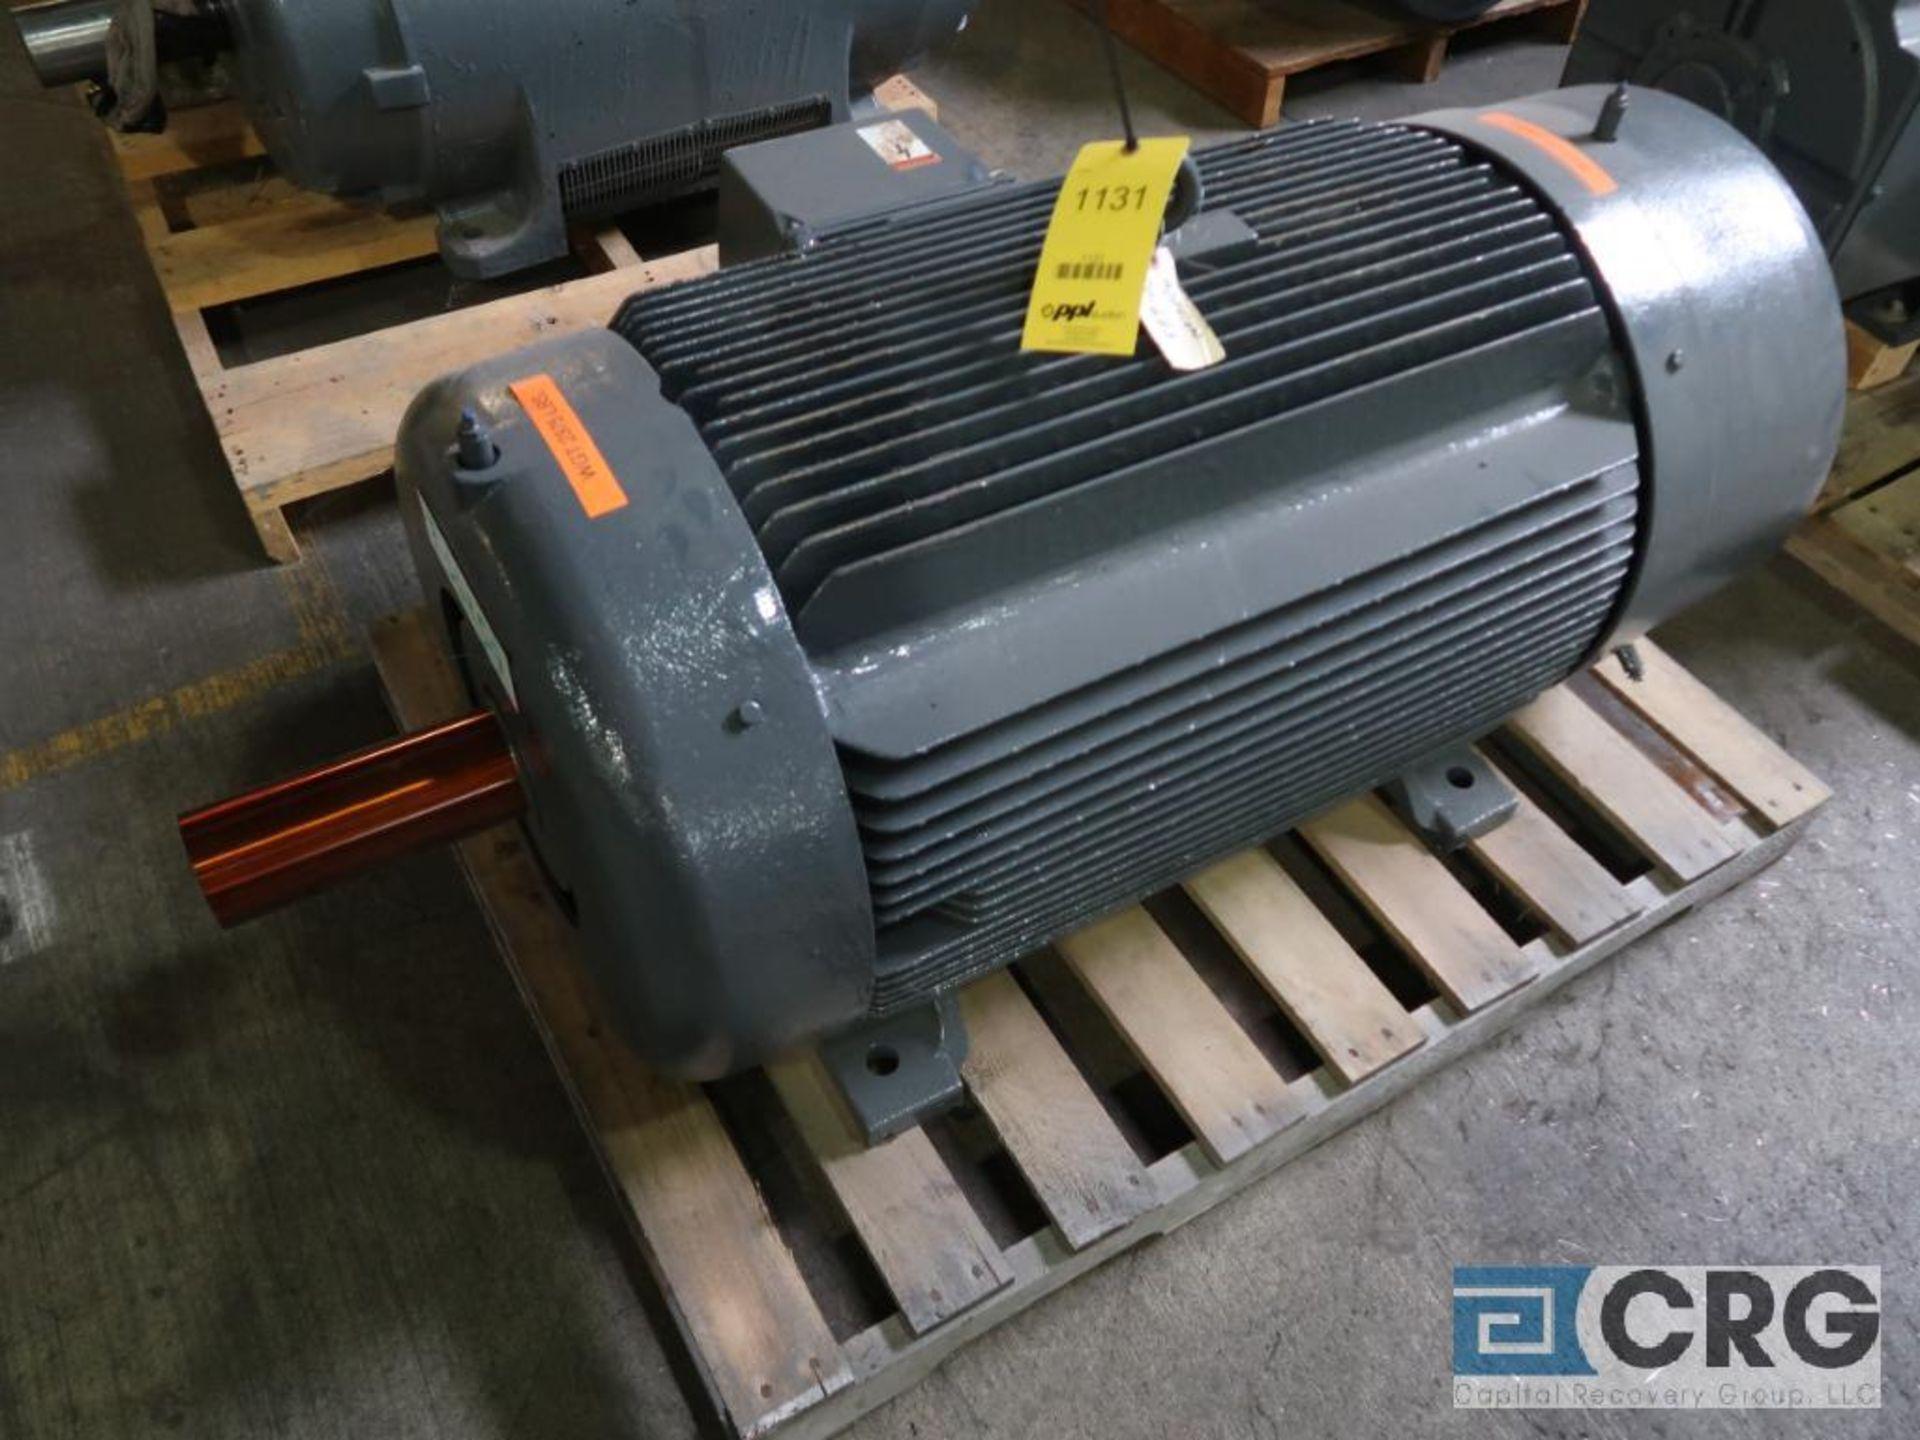 Siemens PE-21 Plus motor, 250 HP, 1,185 RPMs, 460 volt, 3 ph., 449T frame (Finish Building)